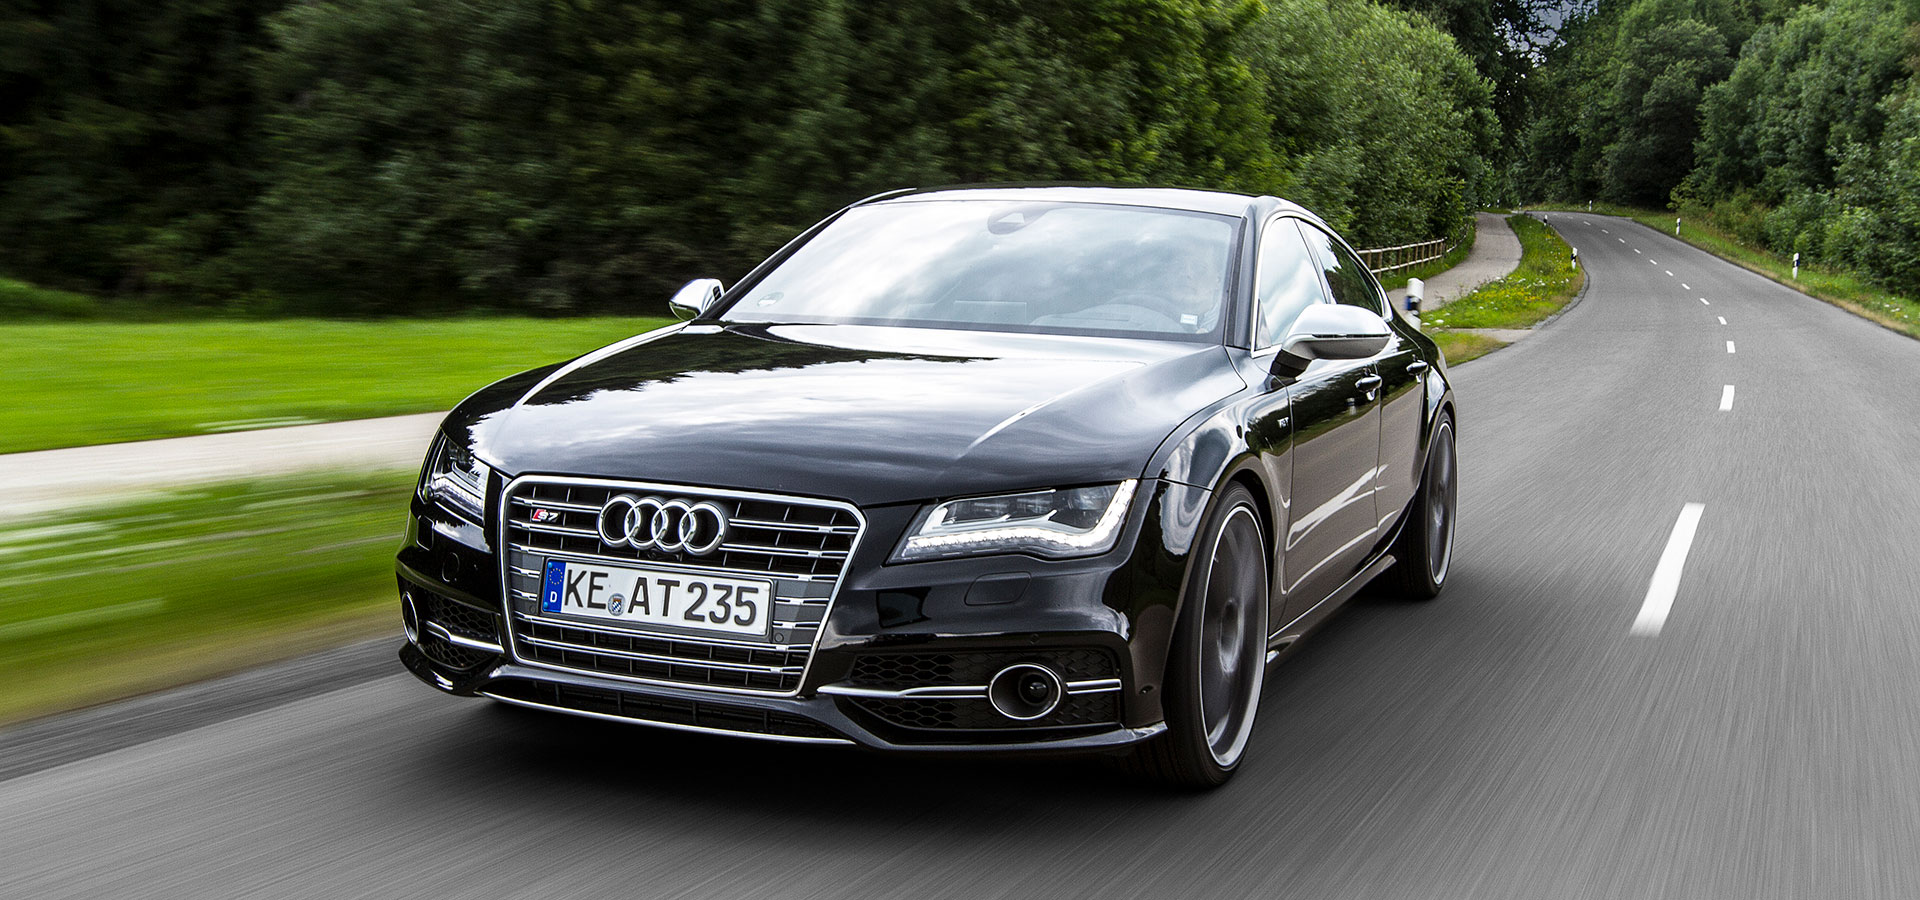 Kelebihan Audi S7 2015 Review